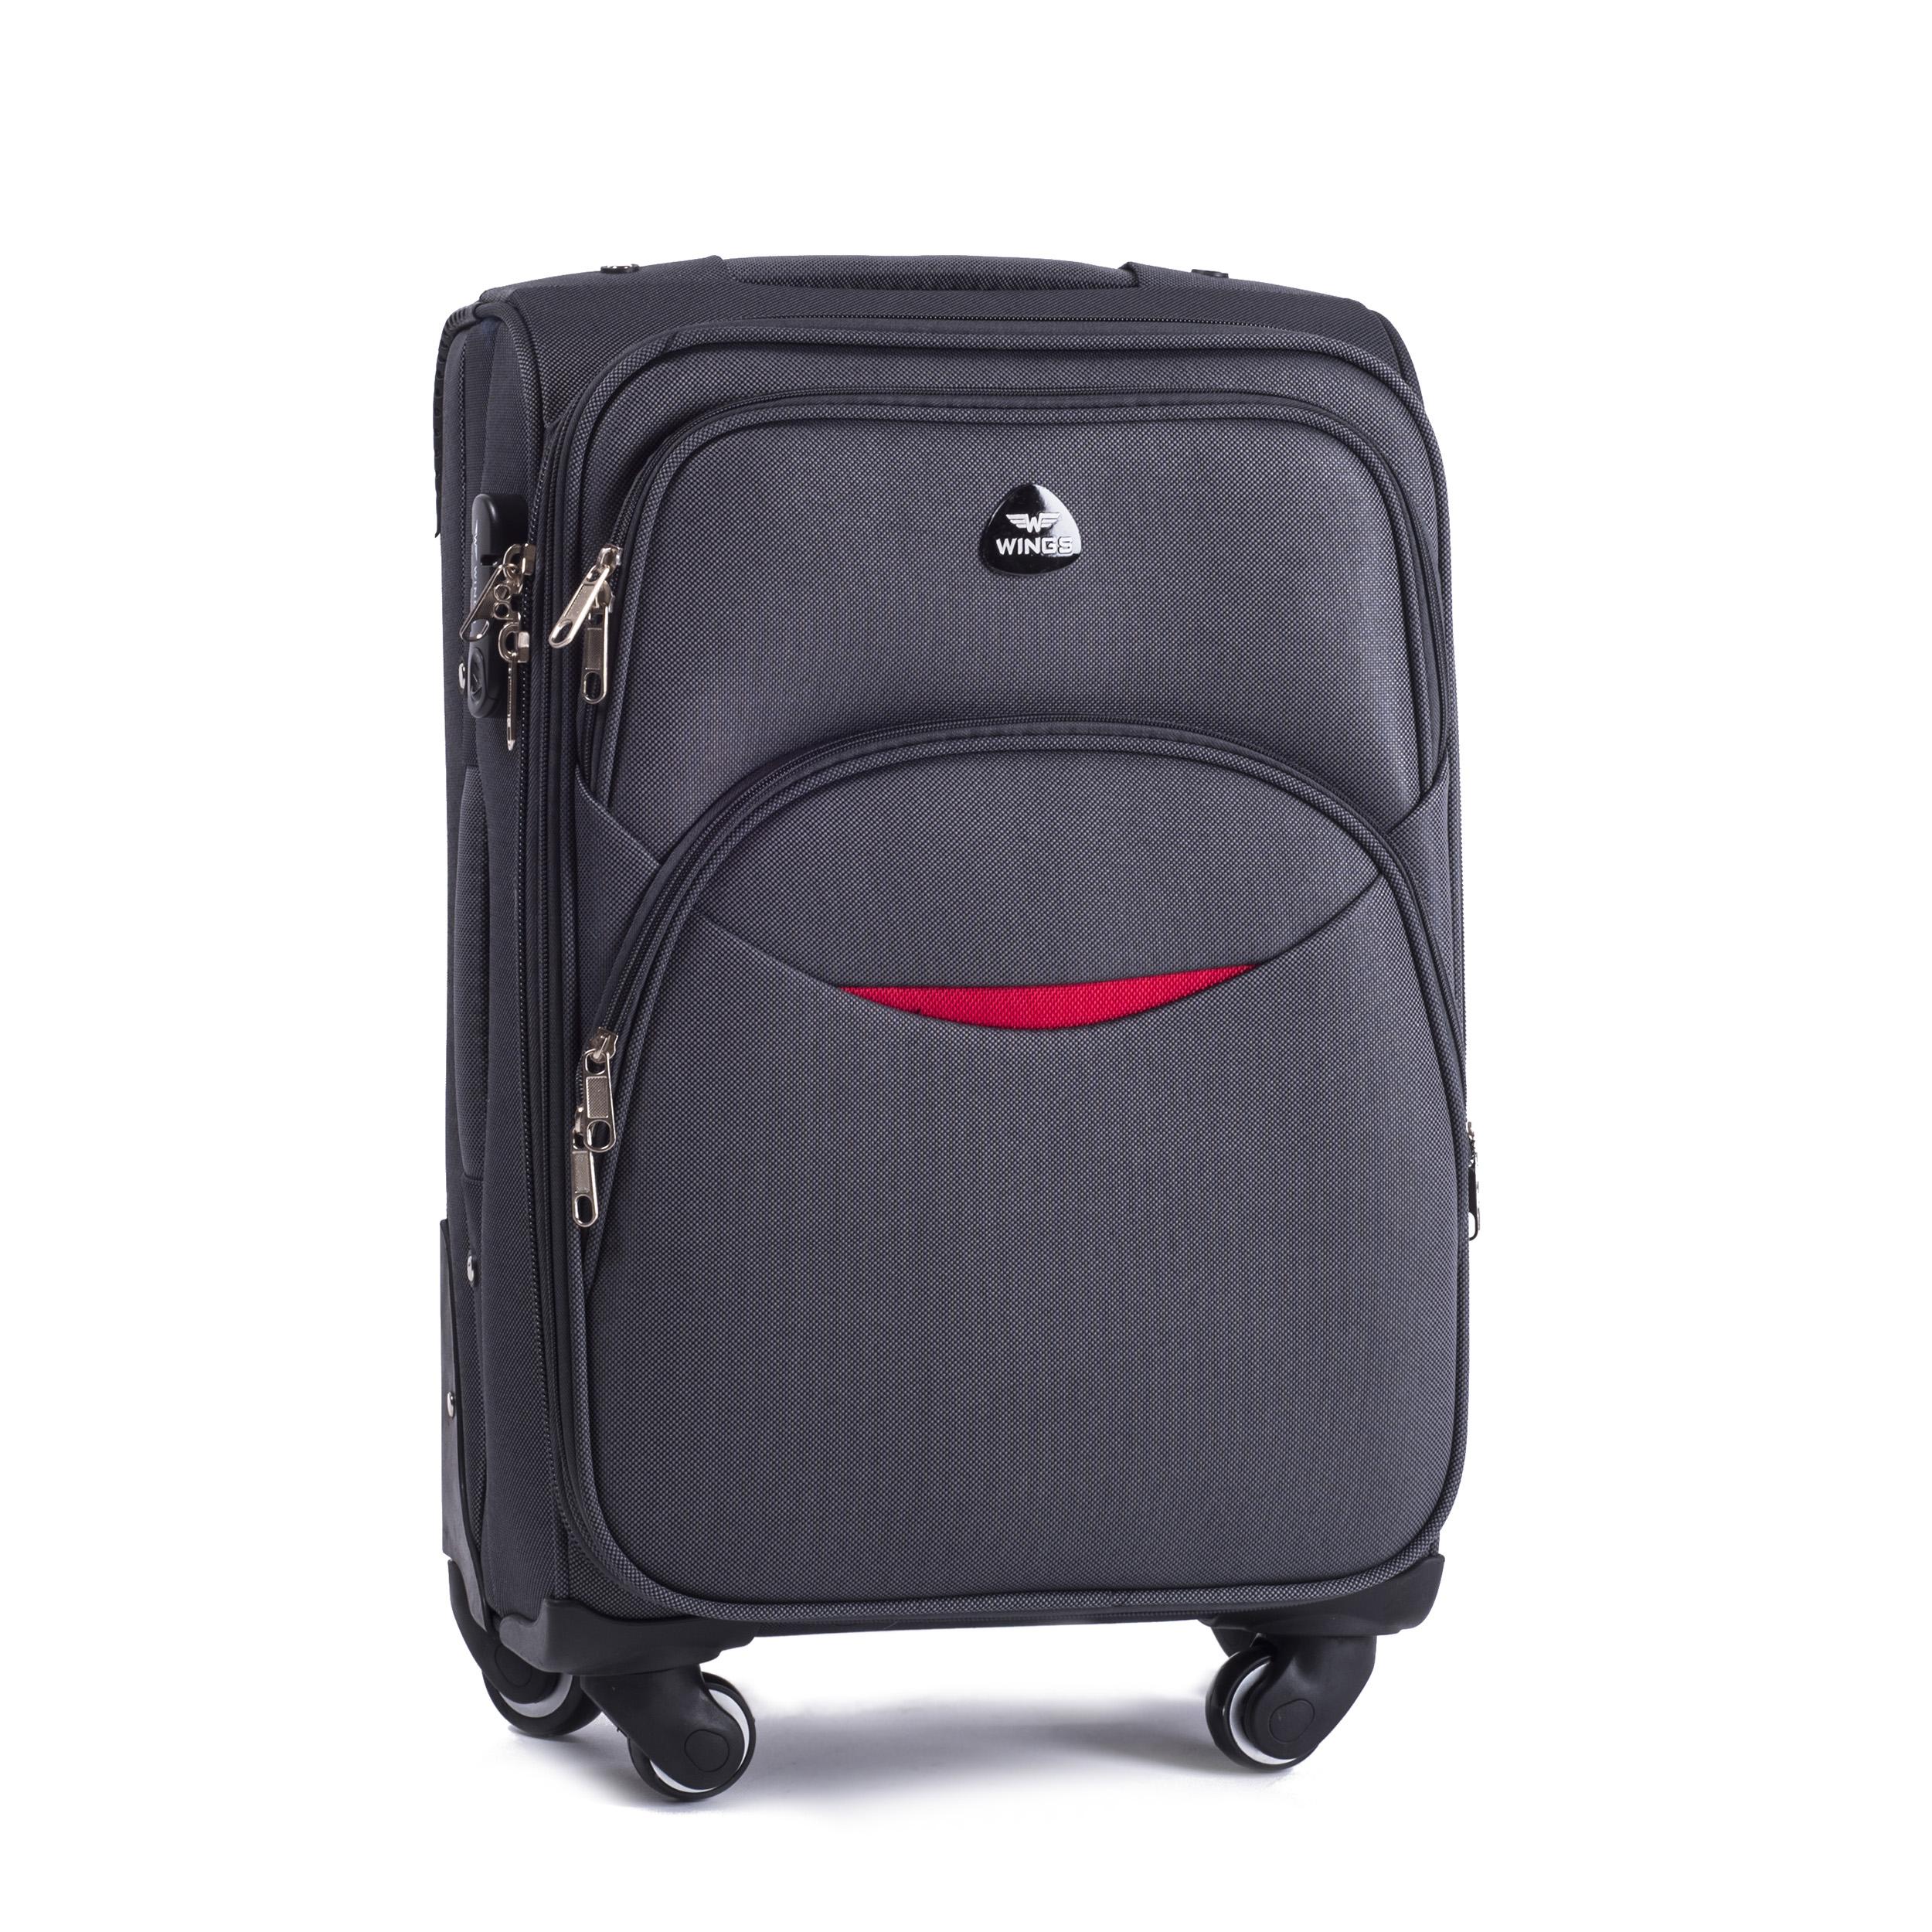 Малый Тканевый Чемодан Wings 1706-4 S D.GREY PREMIUM на 4-х прочных колесах!  Для багажа,до 10 кг